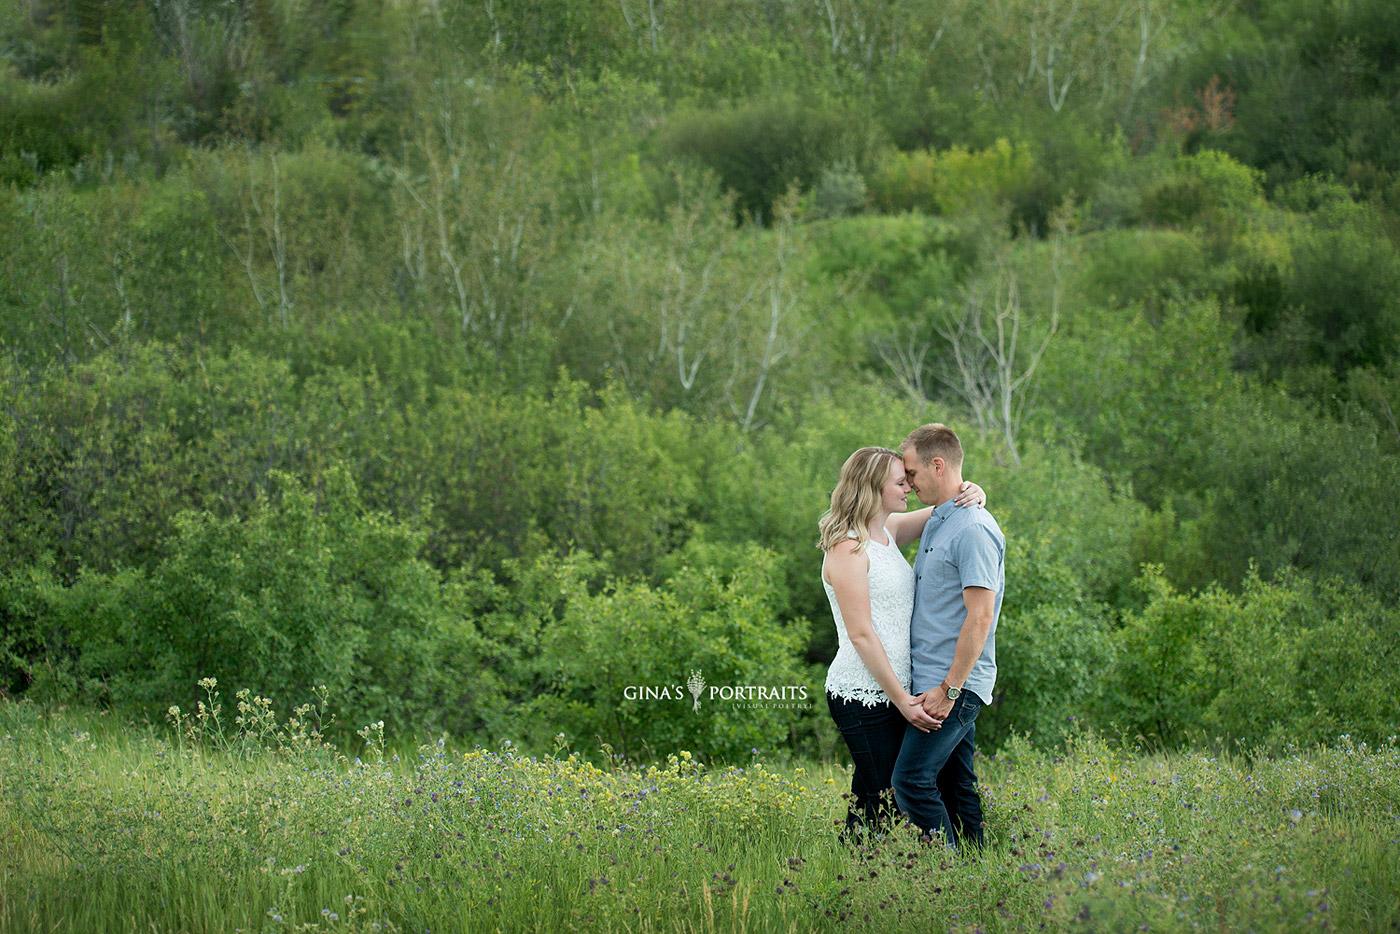 025-Saskatoon_Photographer